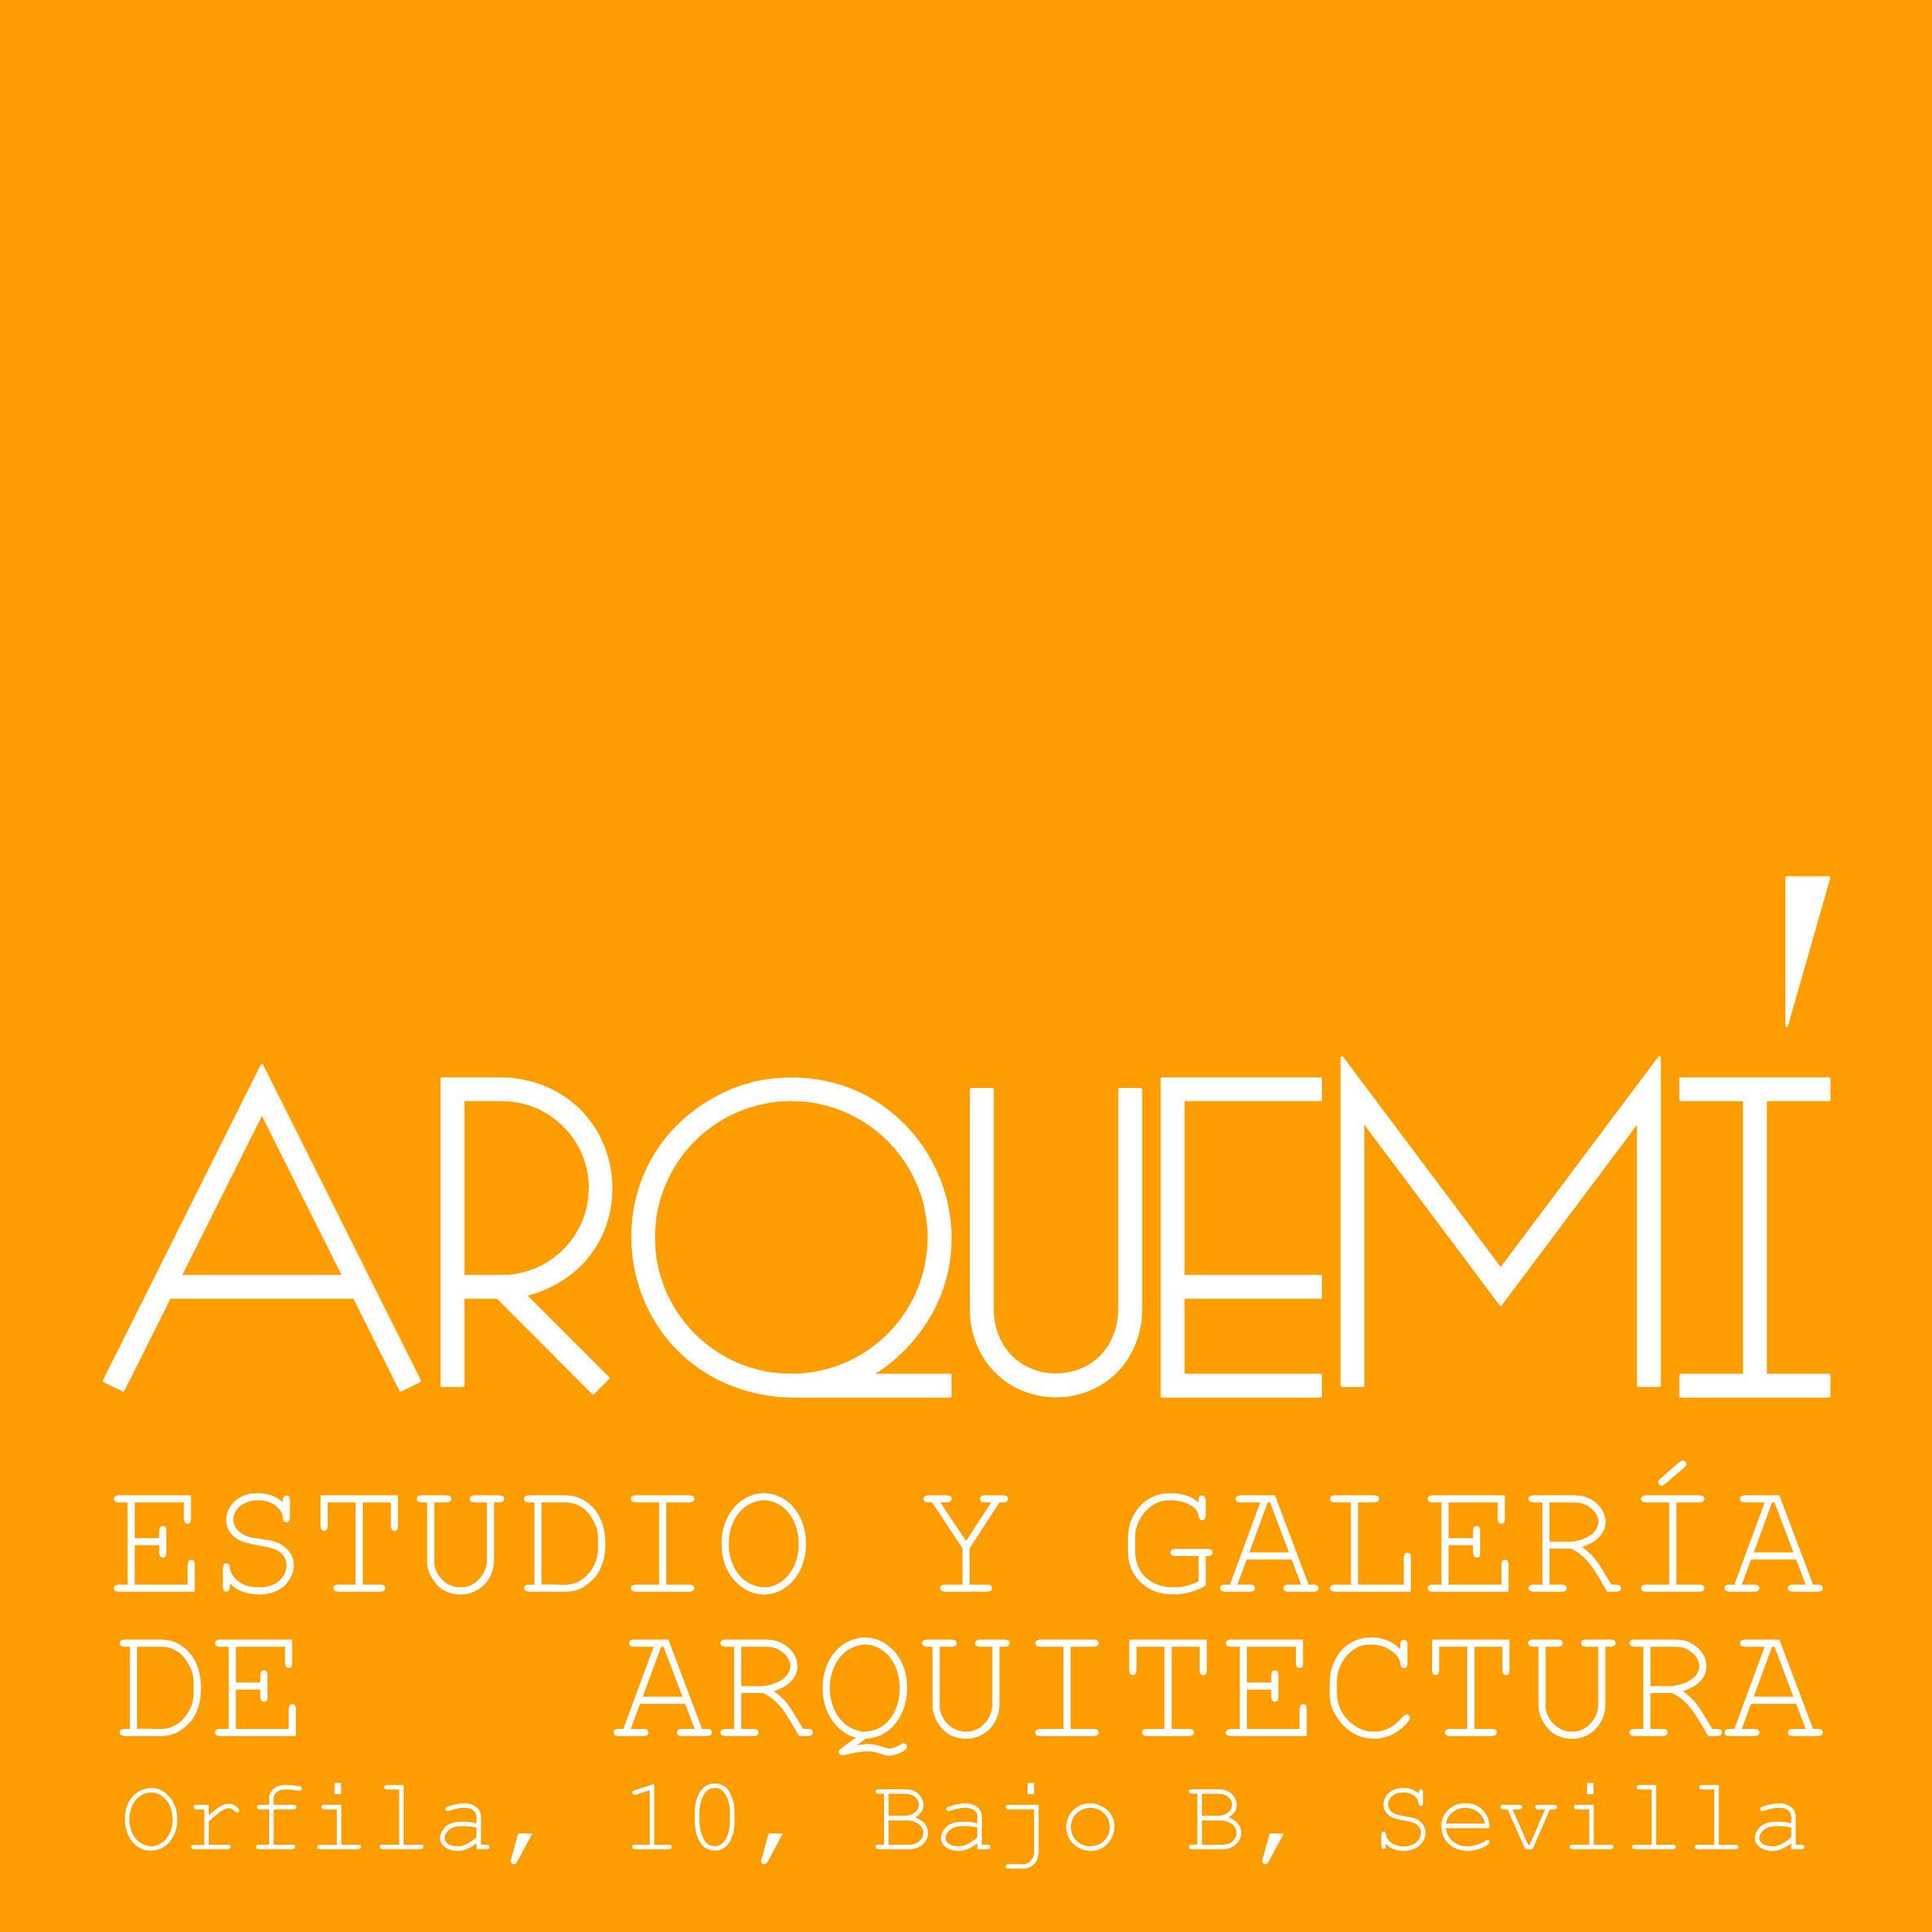 Arquem estudio y galer a de arquitectura sevilla - Estudios de arquitectura sevilla ...